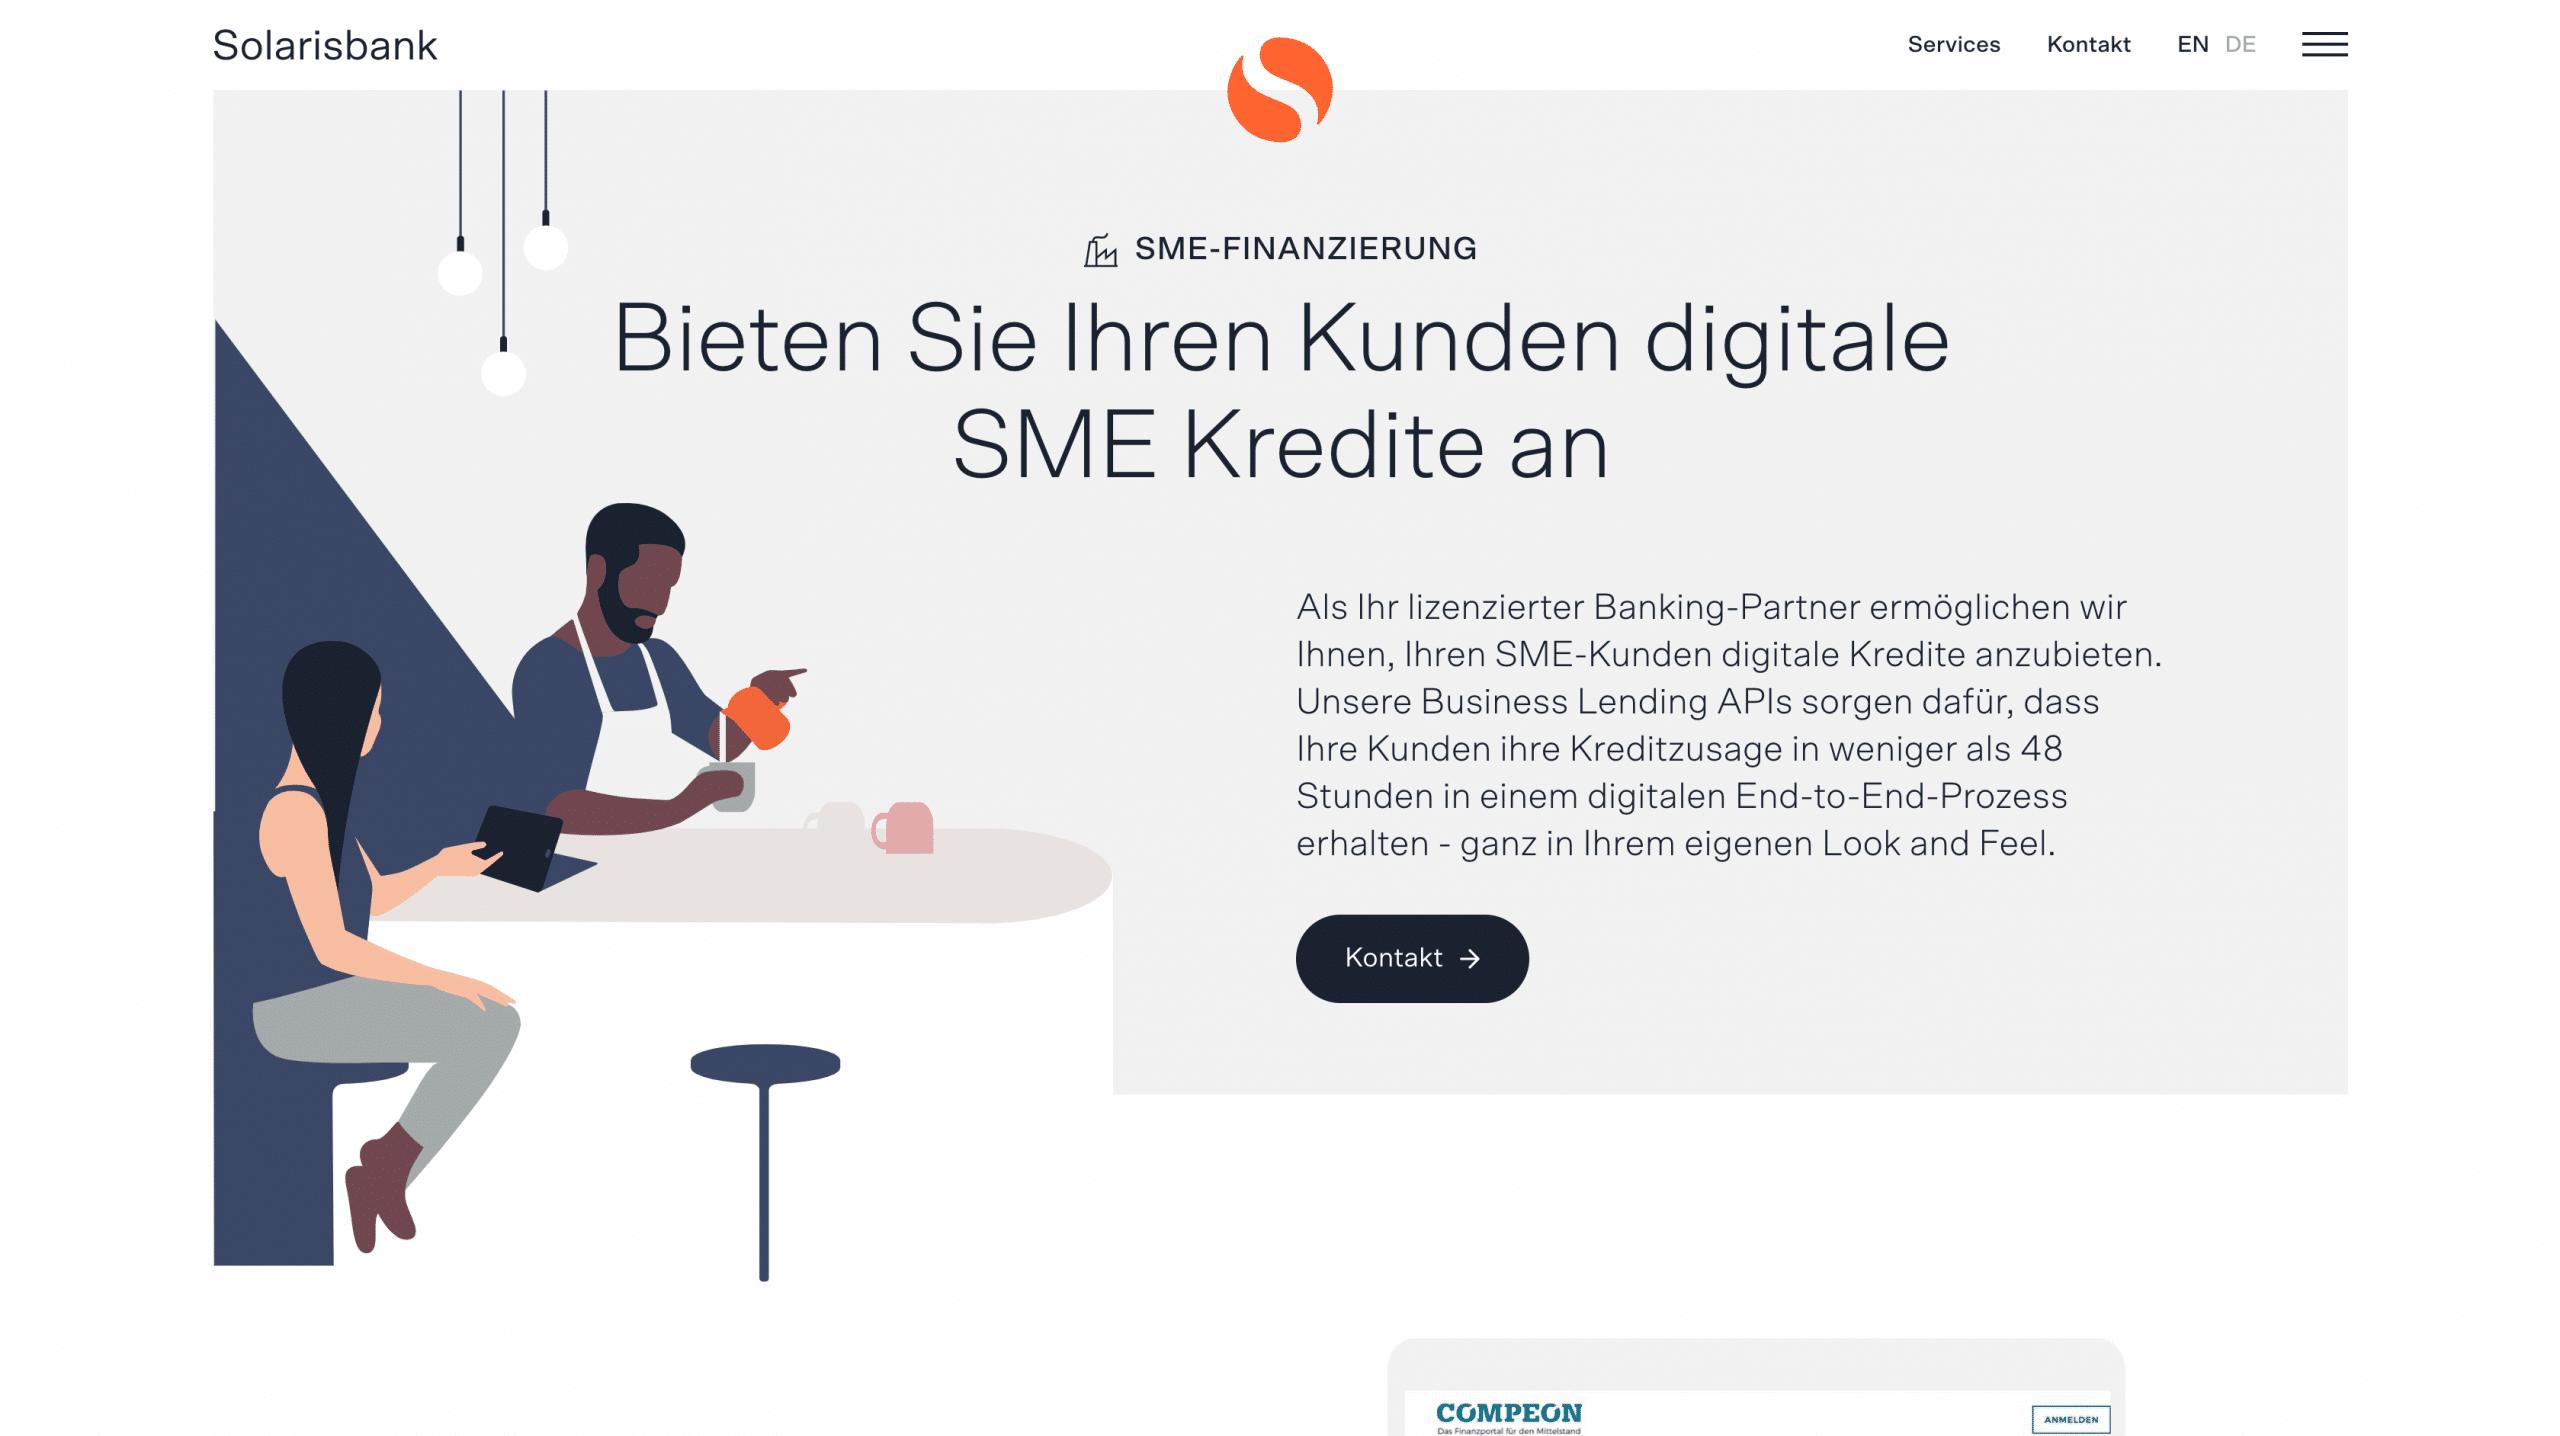 Solarisbank SME Kredit